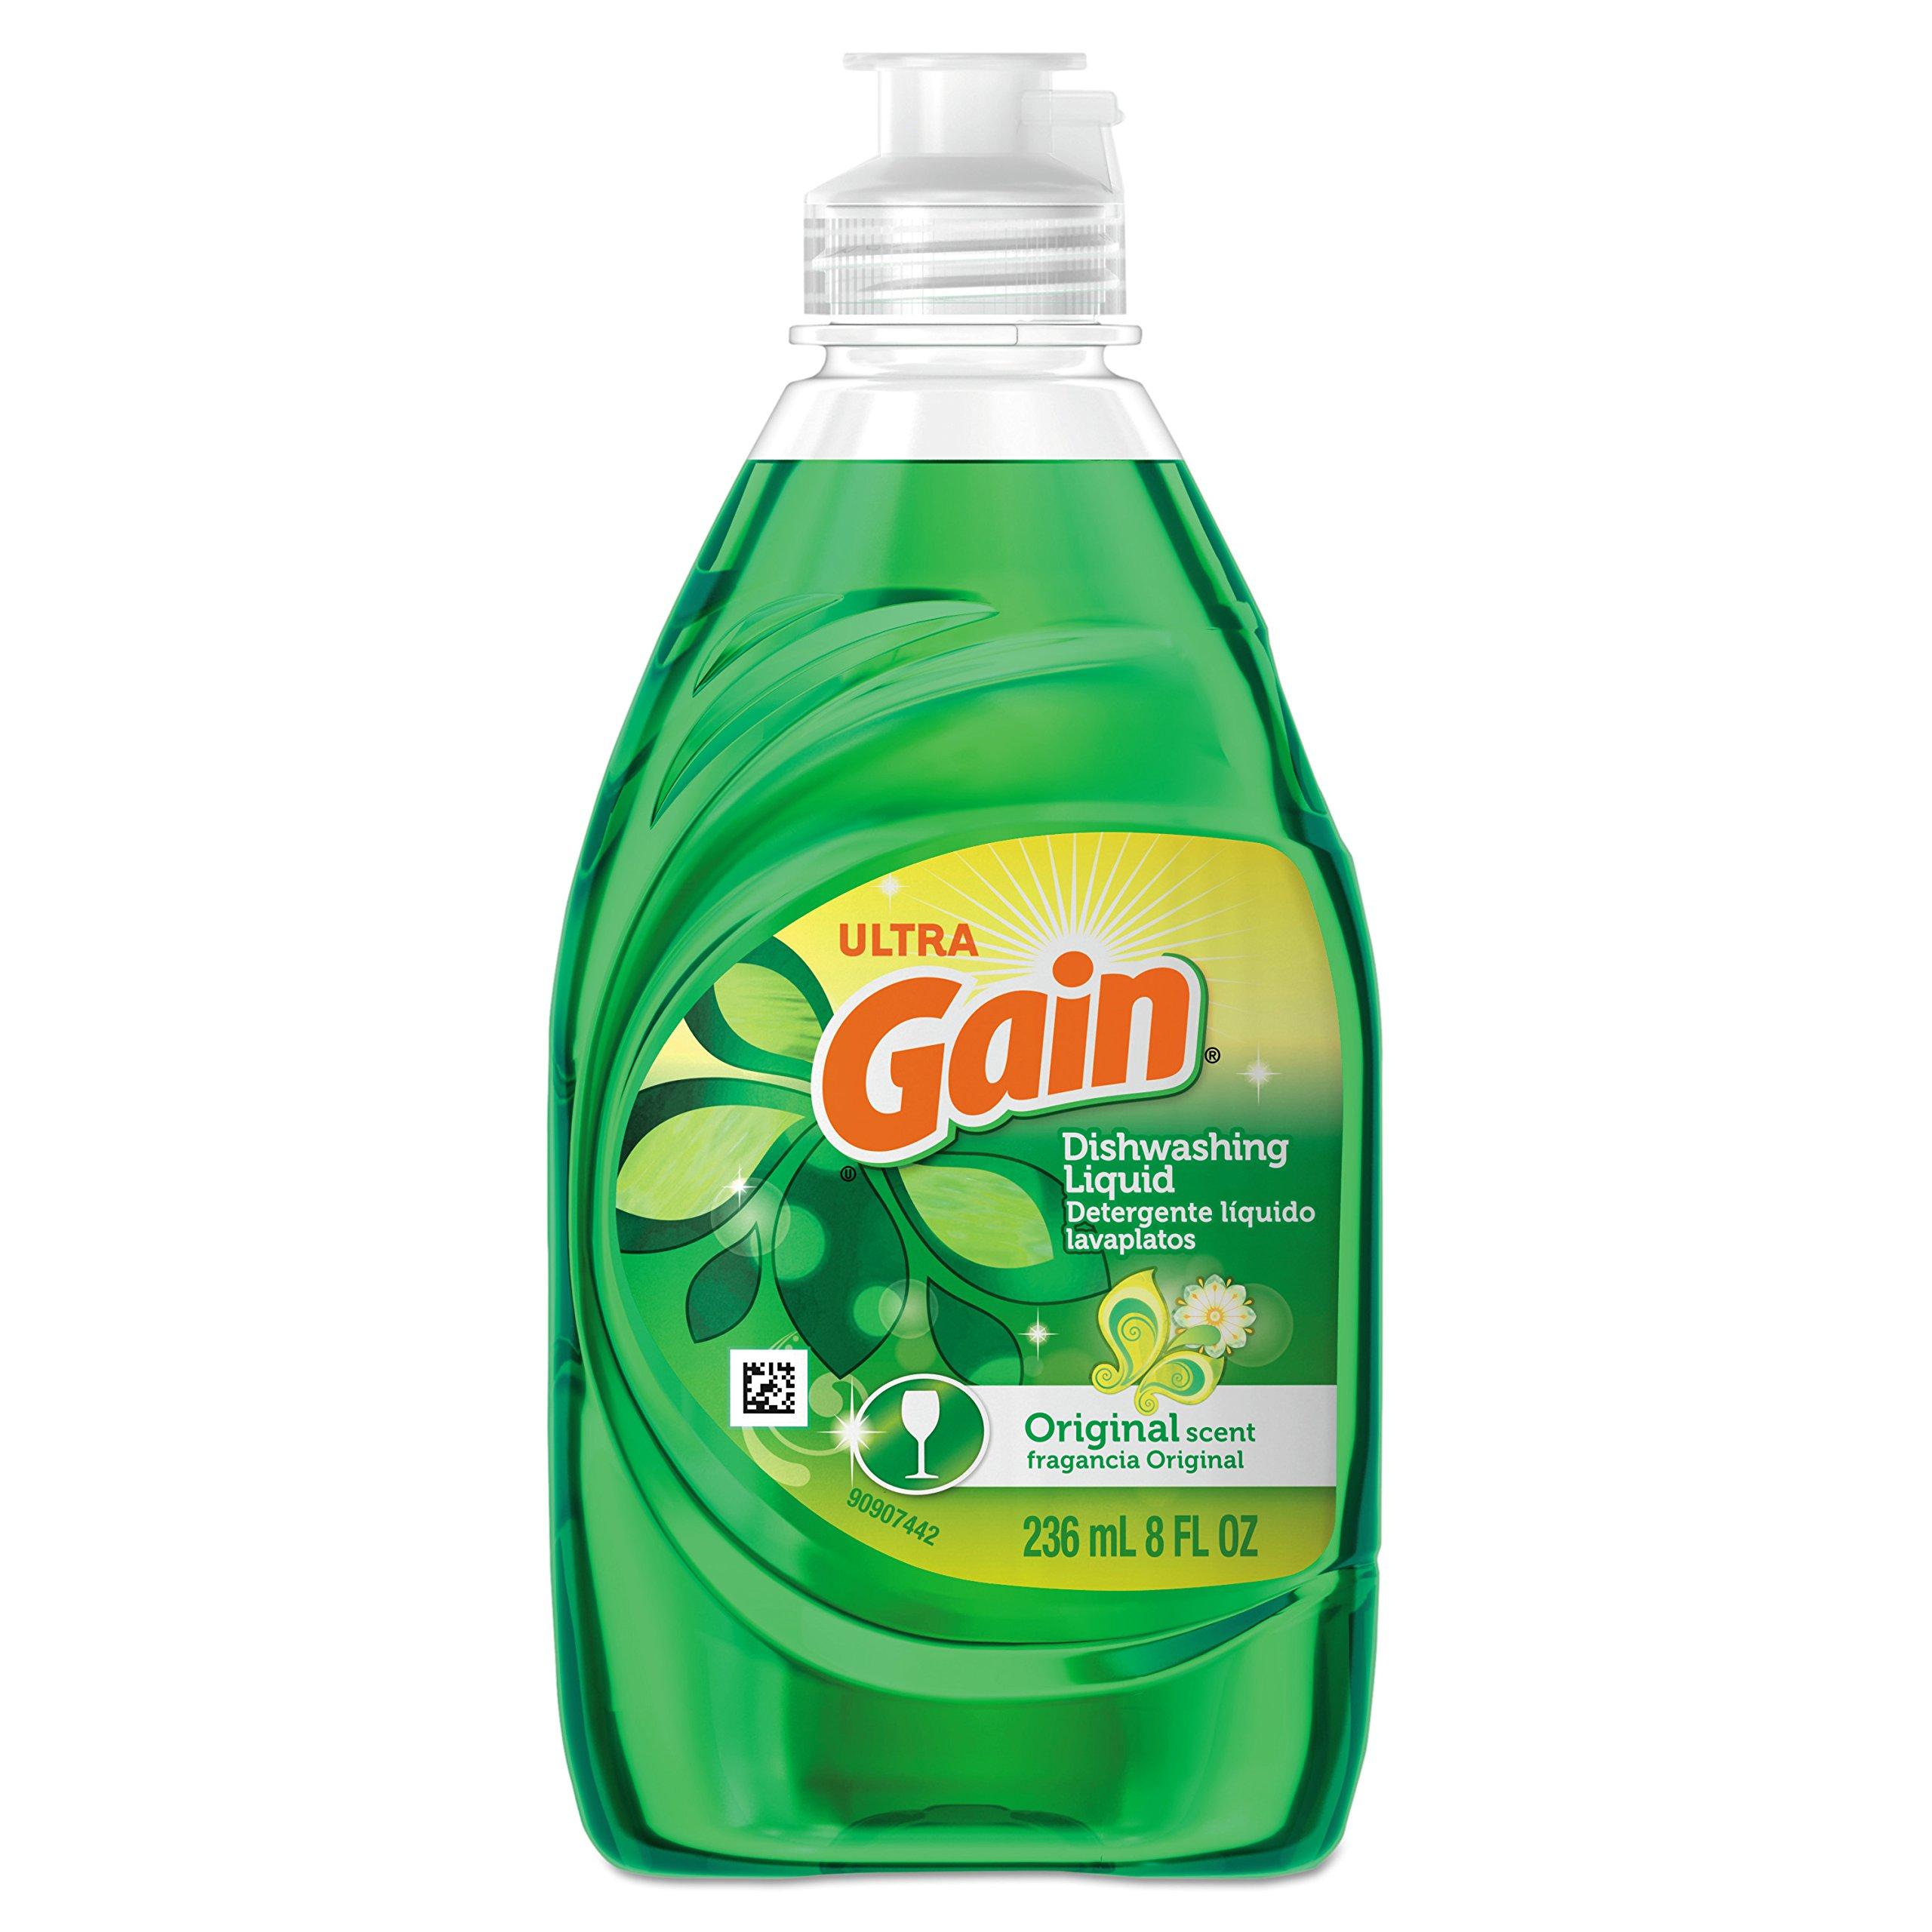 Gain 97614 Dishwashing Liquid, Gain Original, 8 oz. Bottle (Case of 18) by Gain